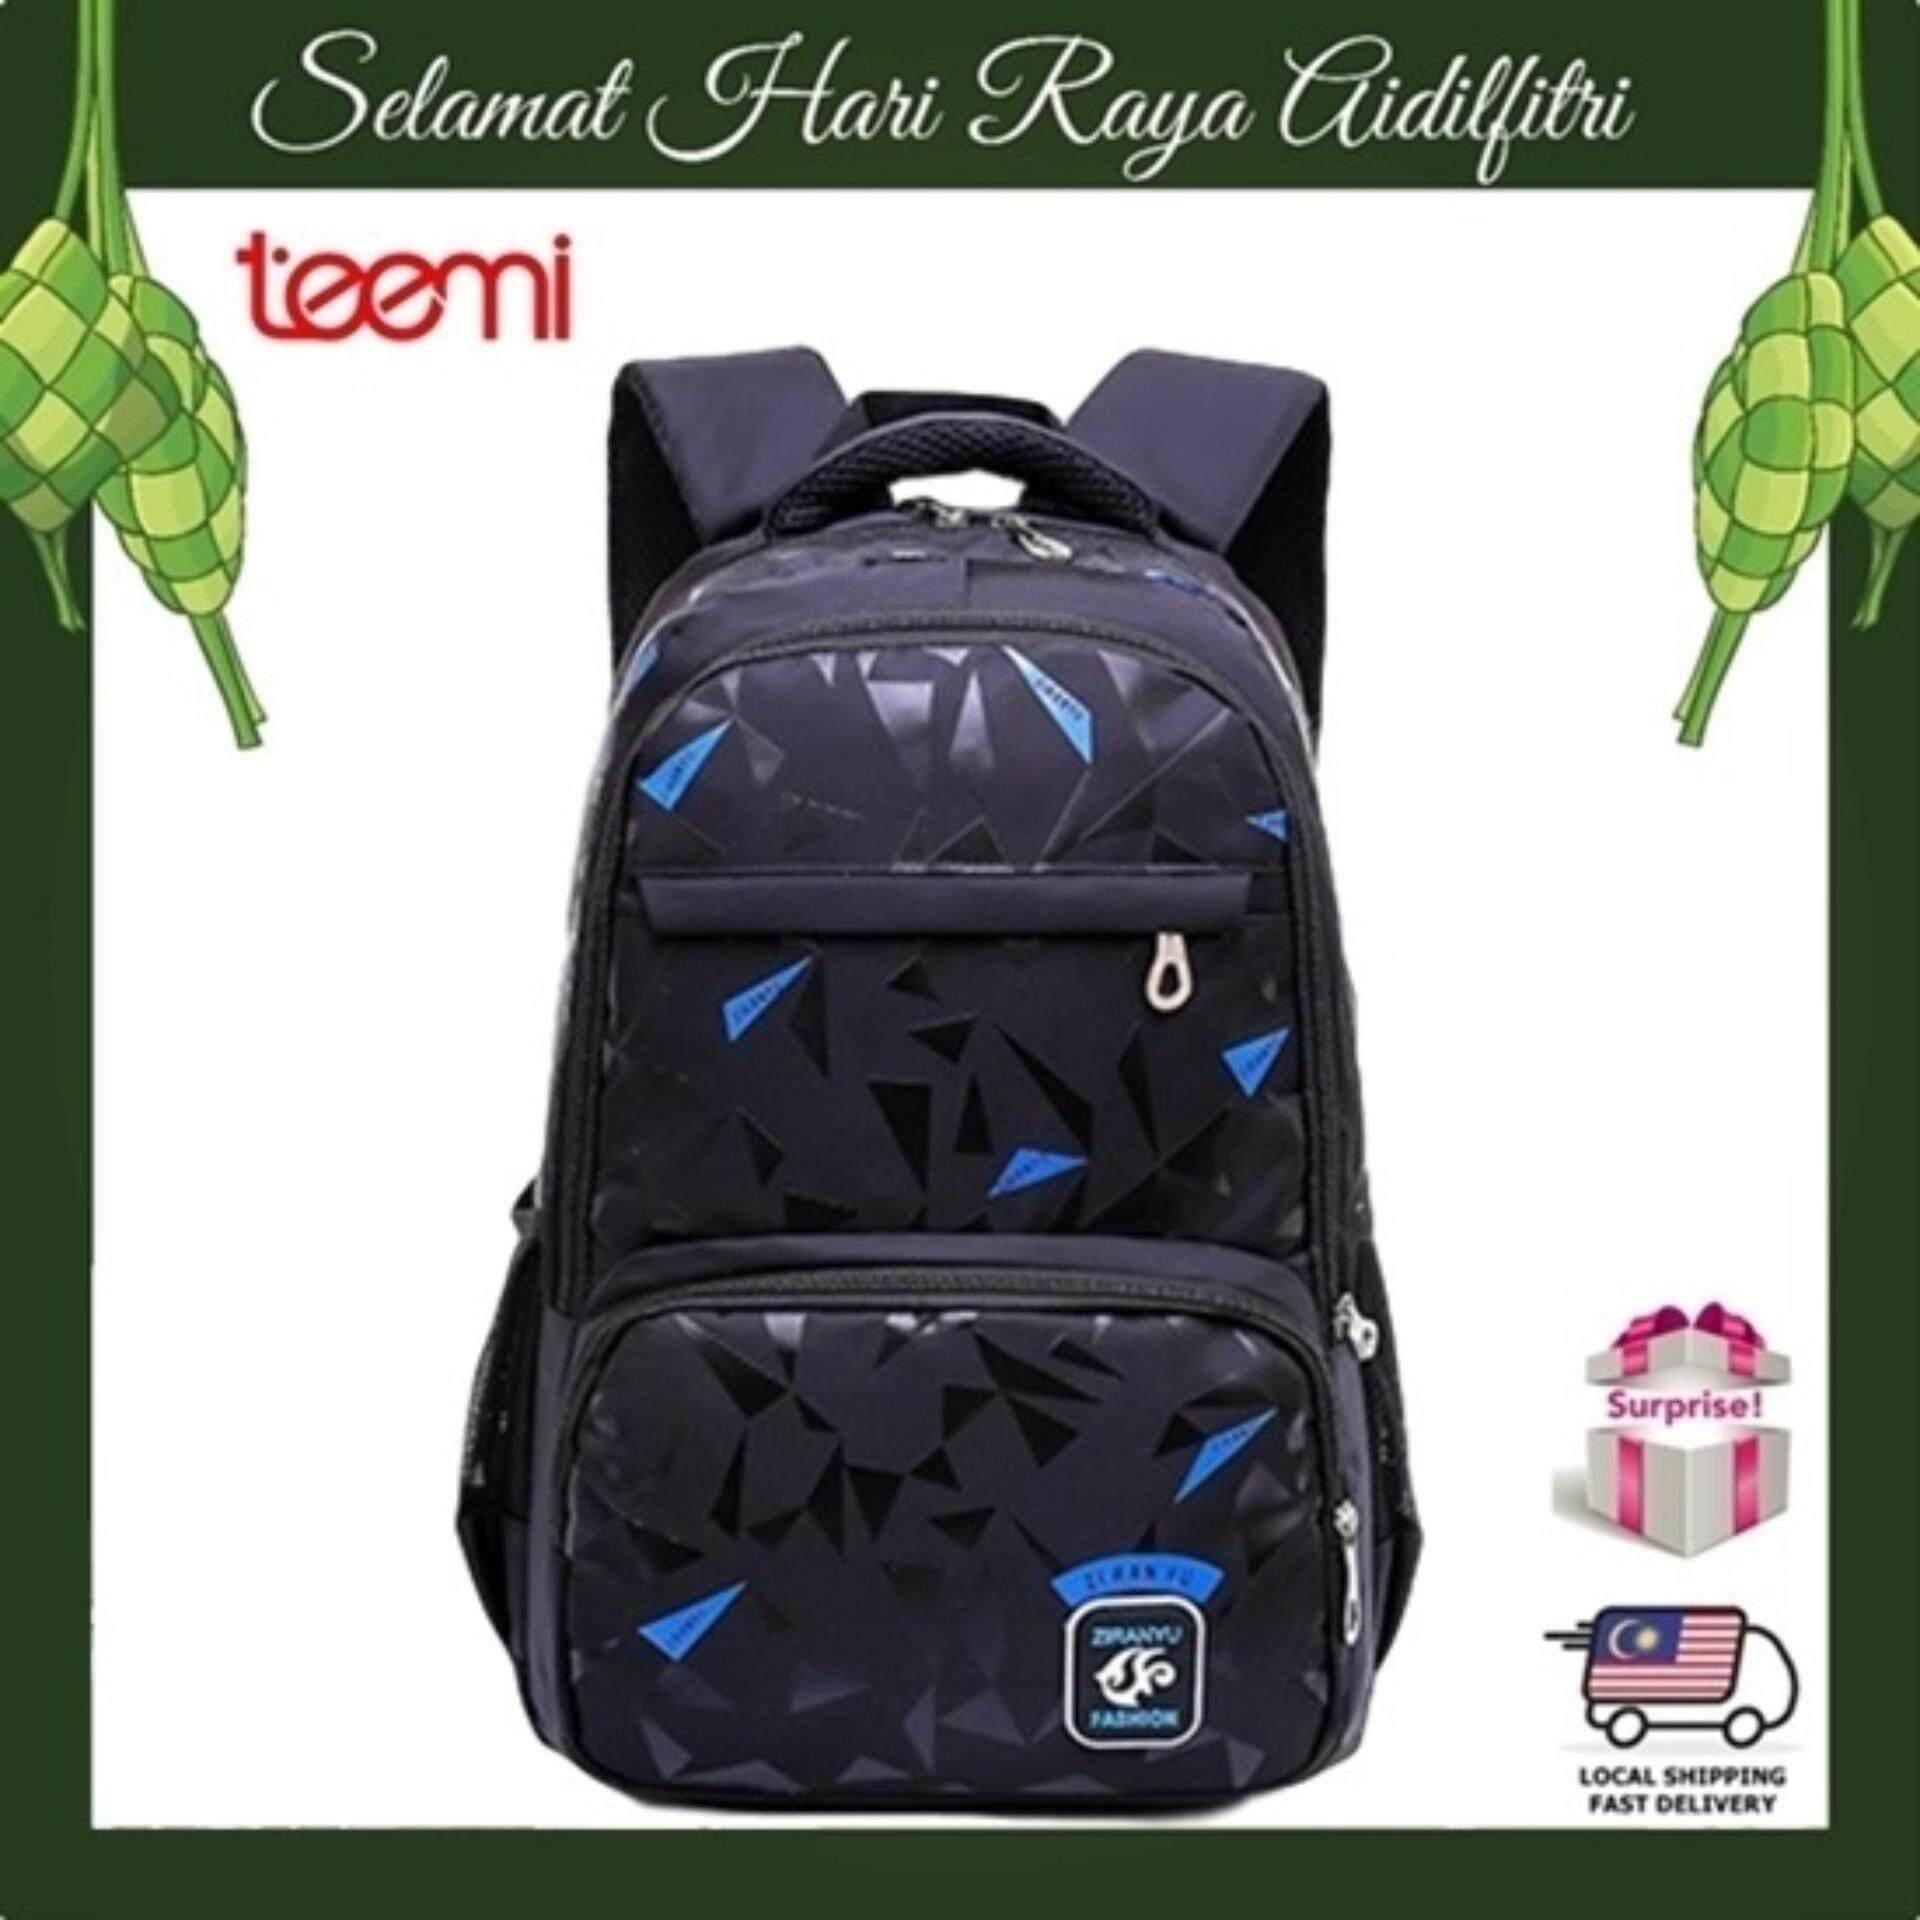 TEEMI Geometric Snow Flakes Highlight Printing Unisex Nylon Backpack Leisure Casual Teen College School Travel Laptop Bag - Black